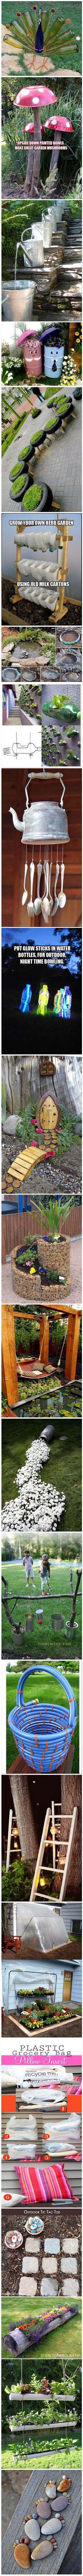 planter hacks- love the milk jug herb garden idea!